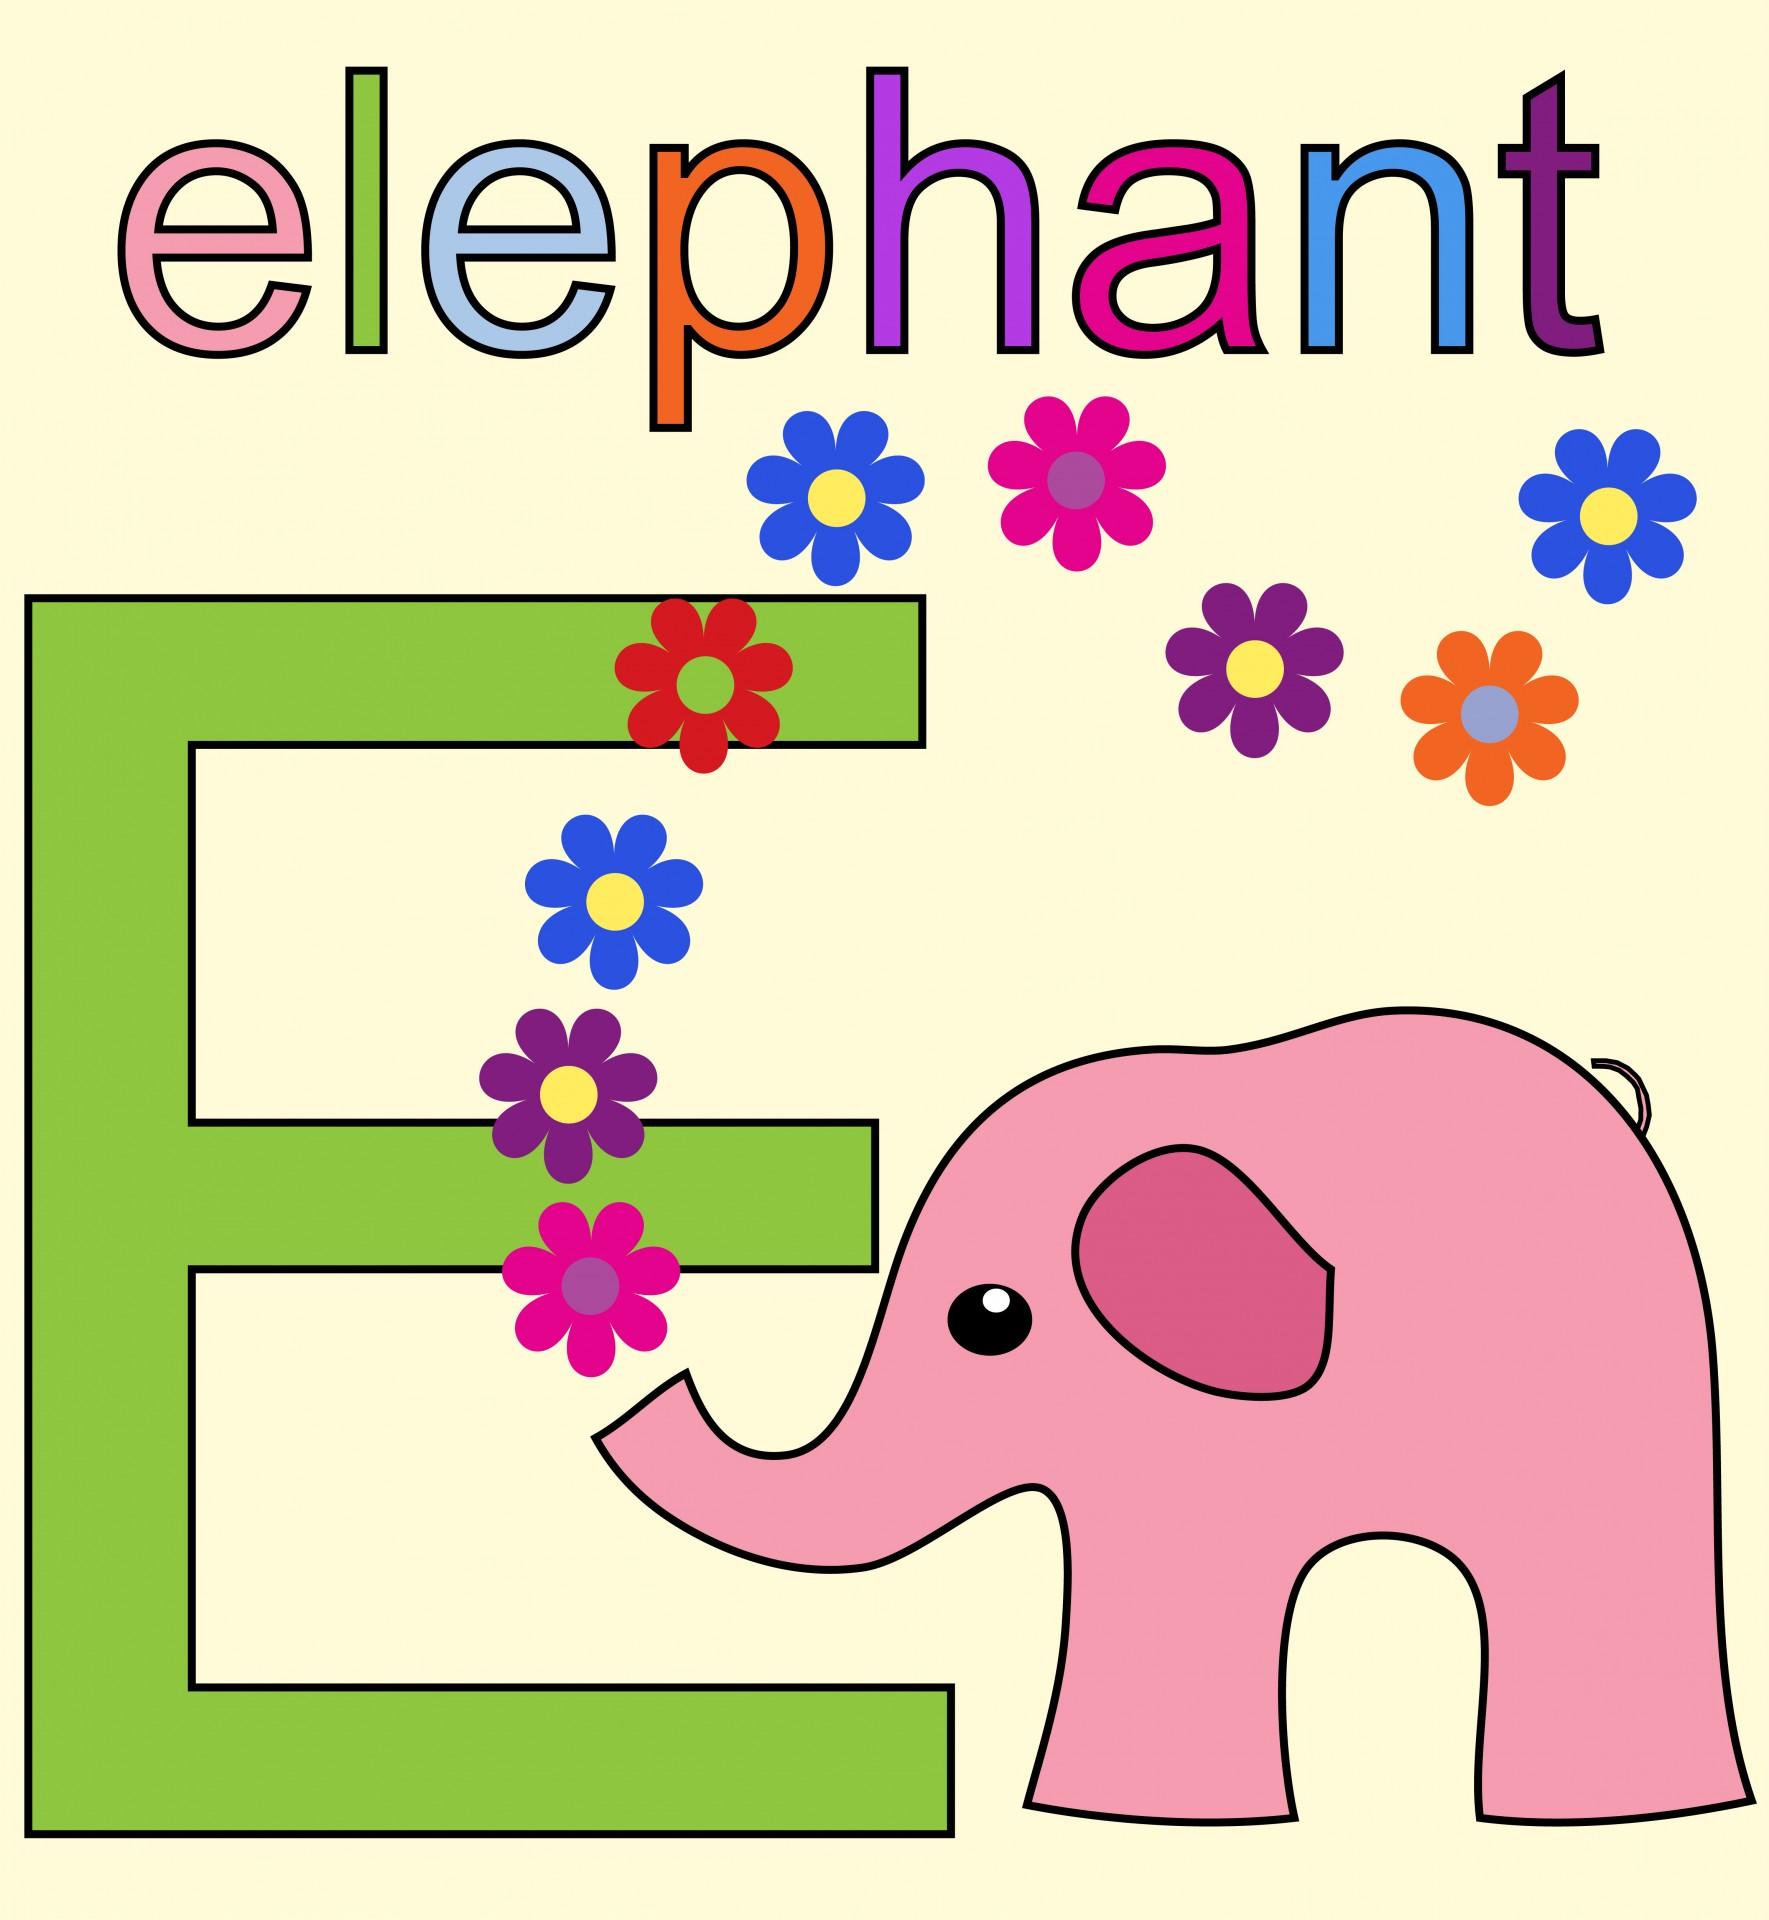 Elephant Alphabet Letter E Free Stock Photo